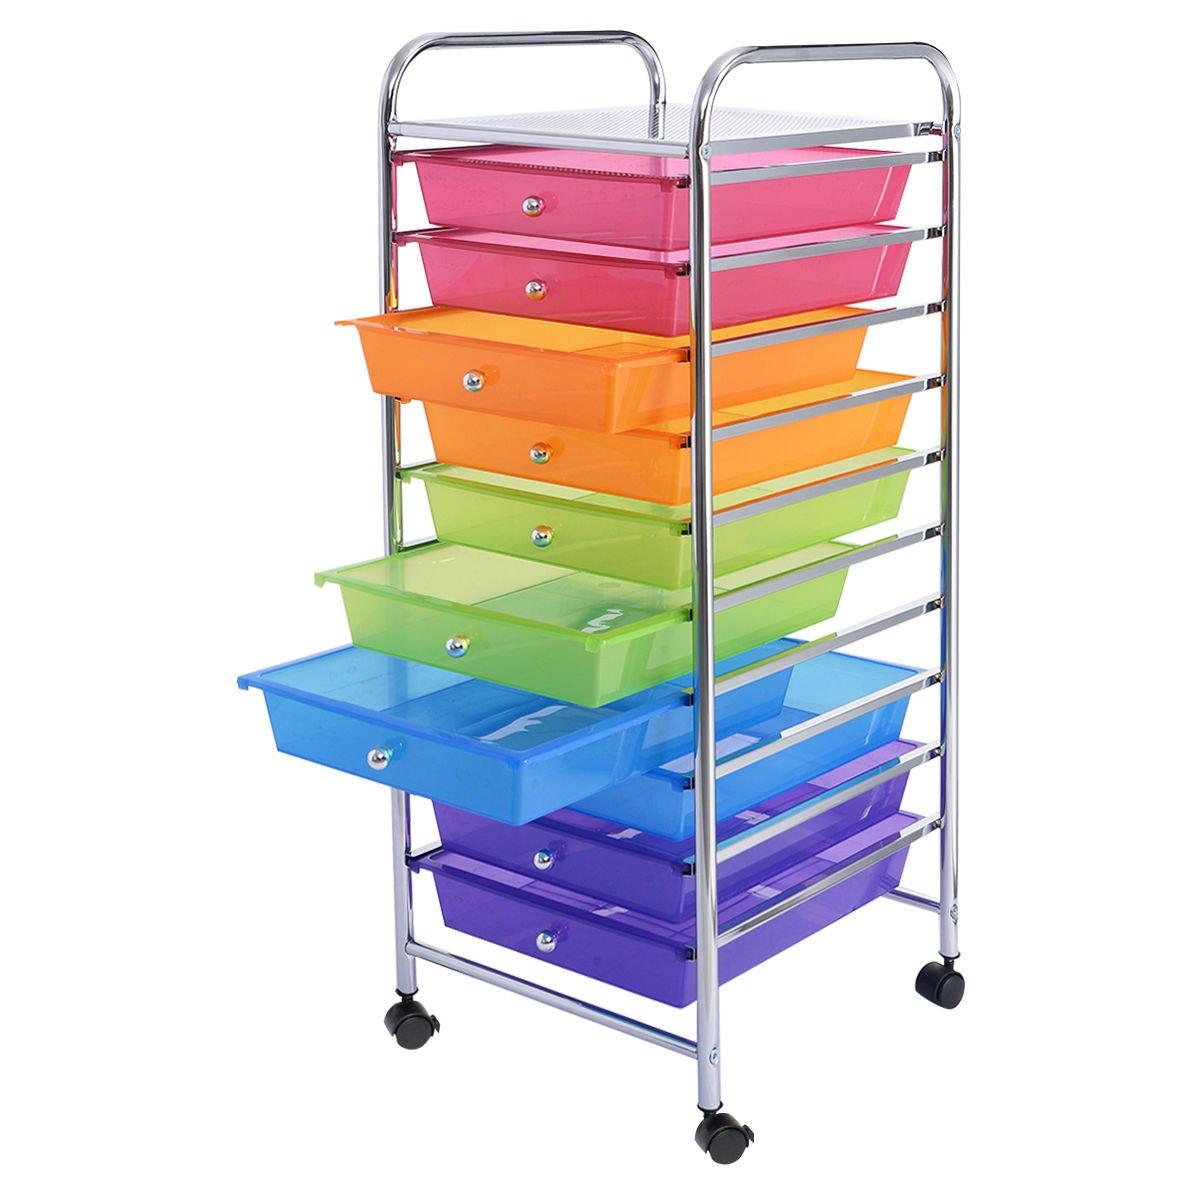 10 Rainbow Drawer Lockable Wheel Office School Scrapbook Organizer Rolling Paper Storage Cart with 4 Caster